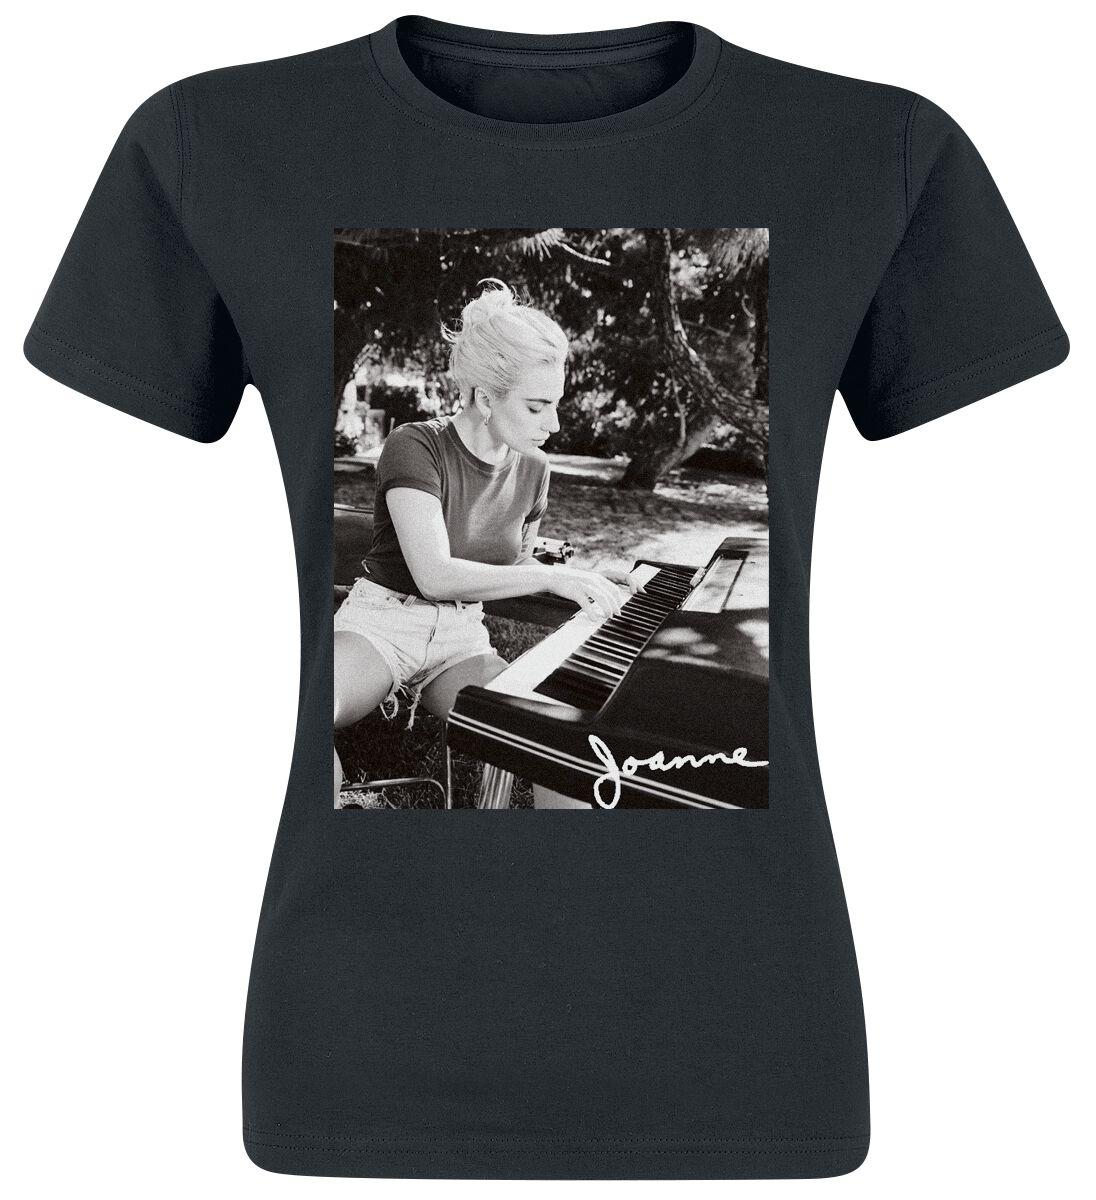 Zespoły - Koszulki - Koszulka damska Lady Gaga Joanne Piano Photo Koszulka damska czarny - 367316